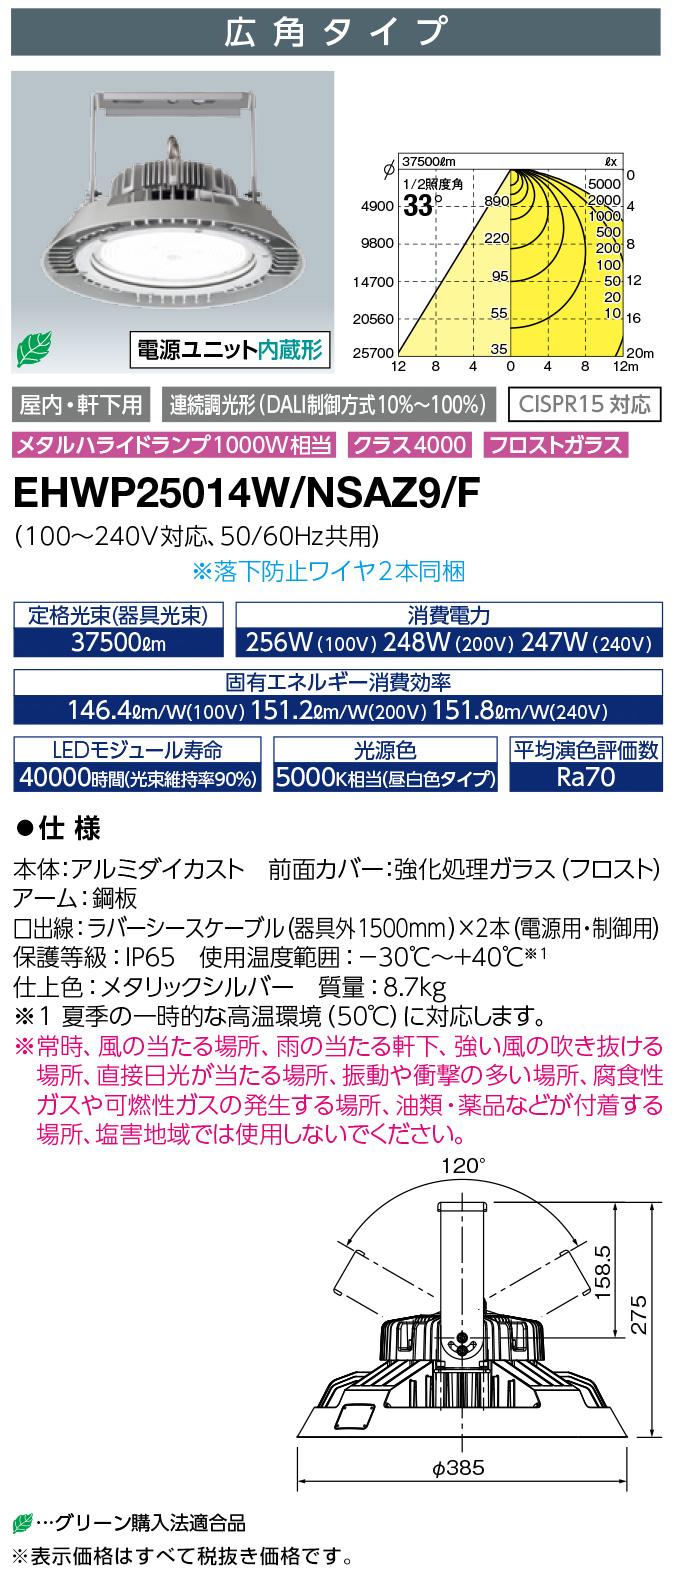 EHWP25014W/NSAZ9/F